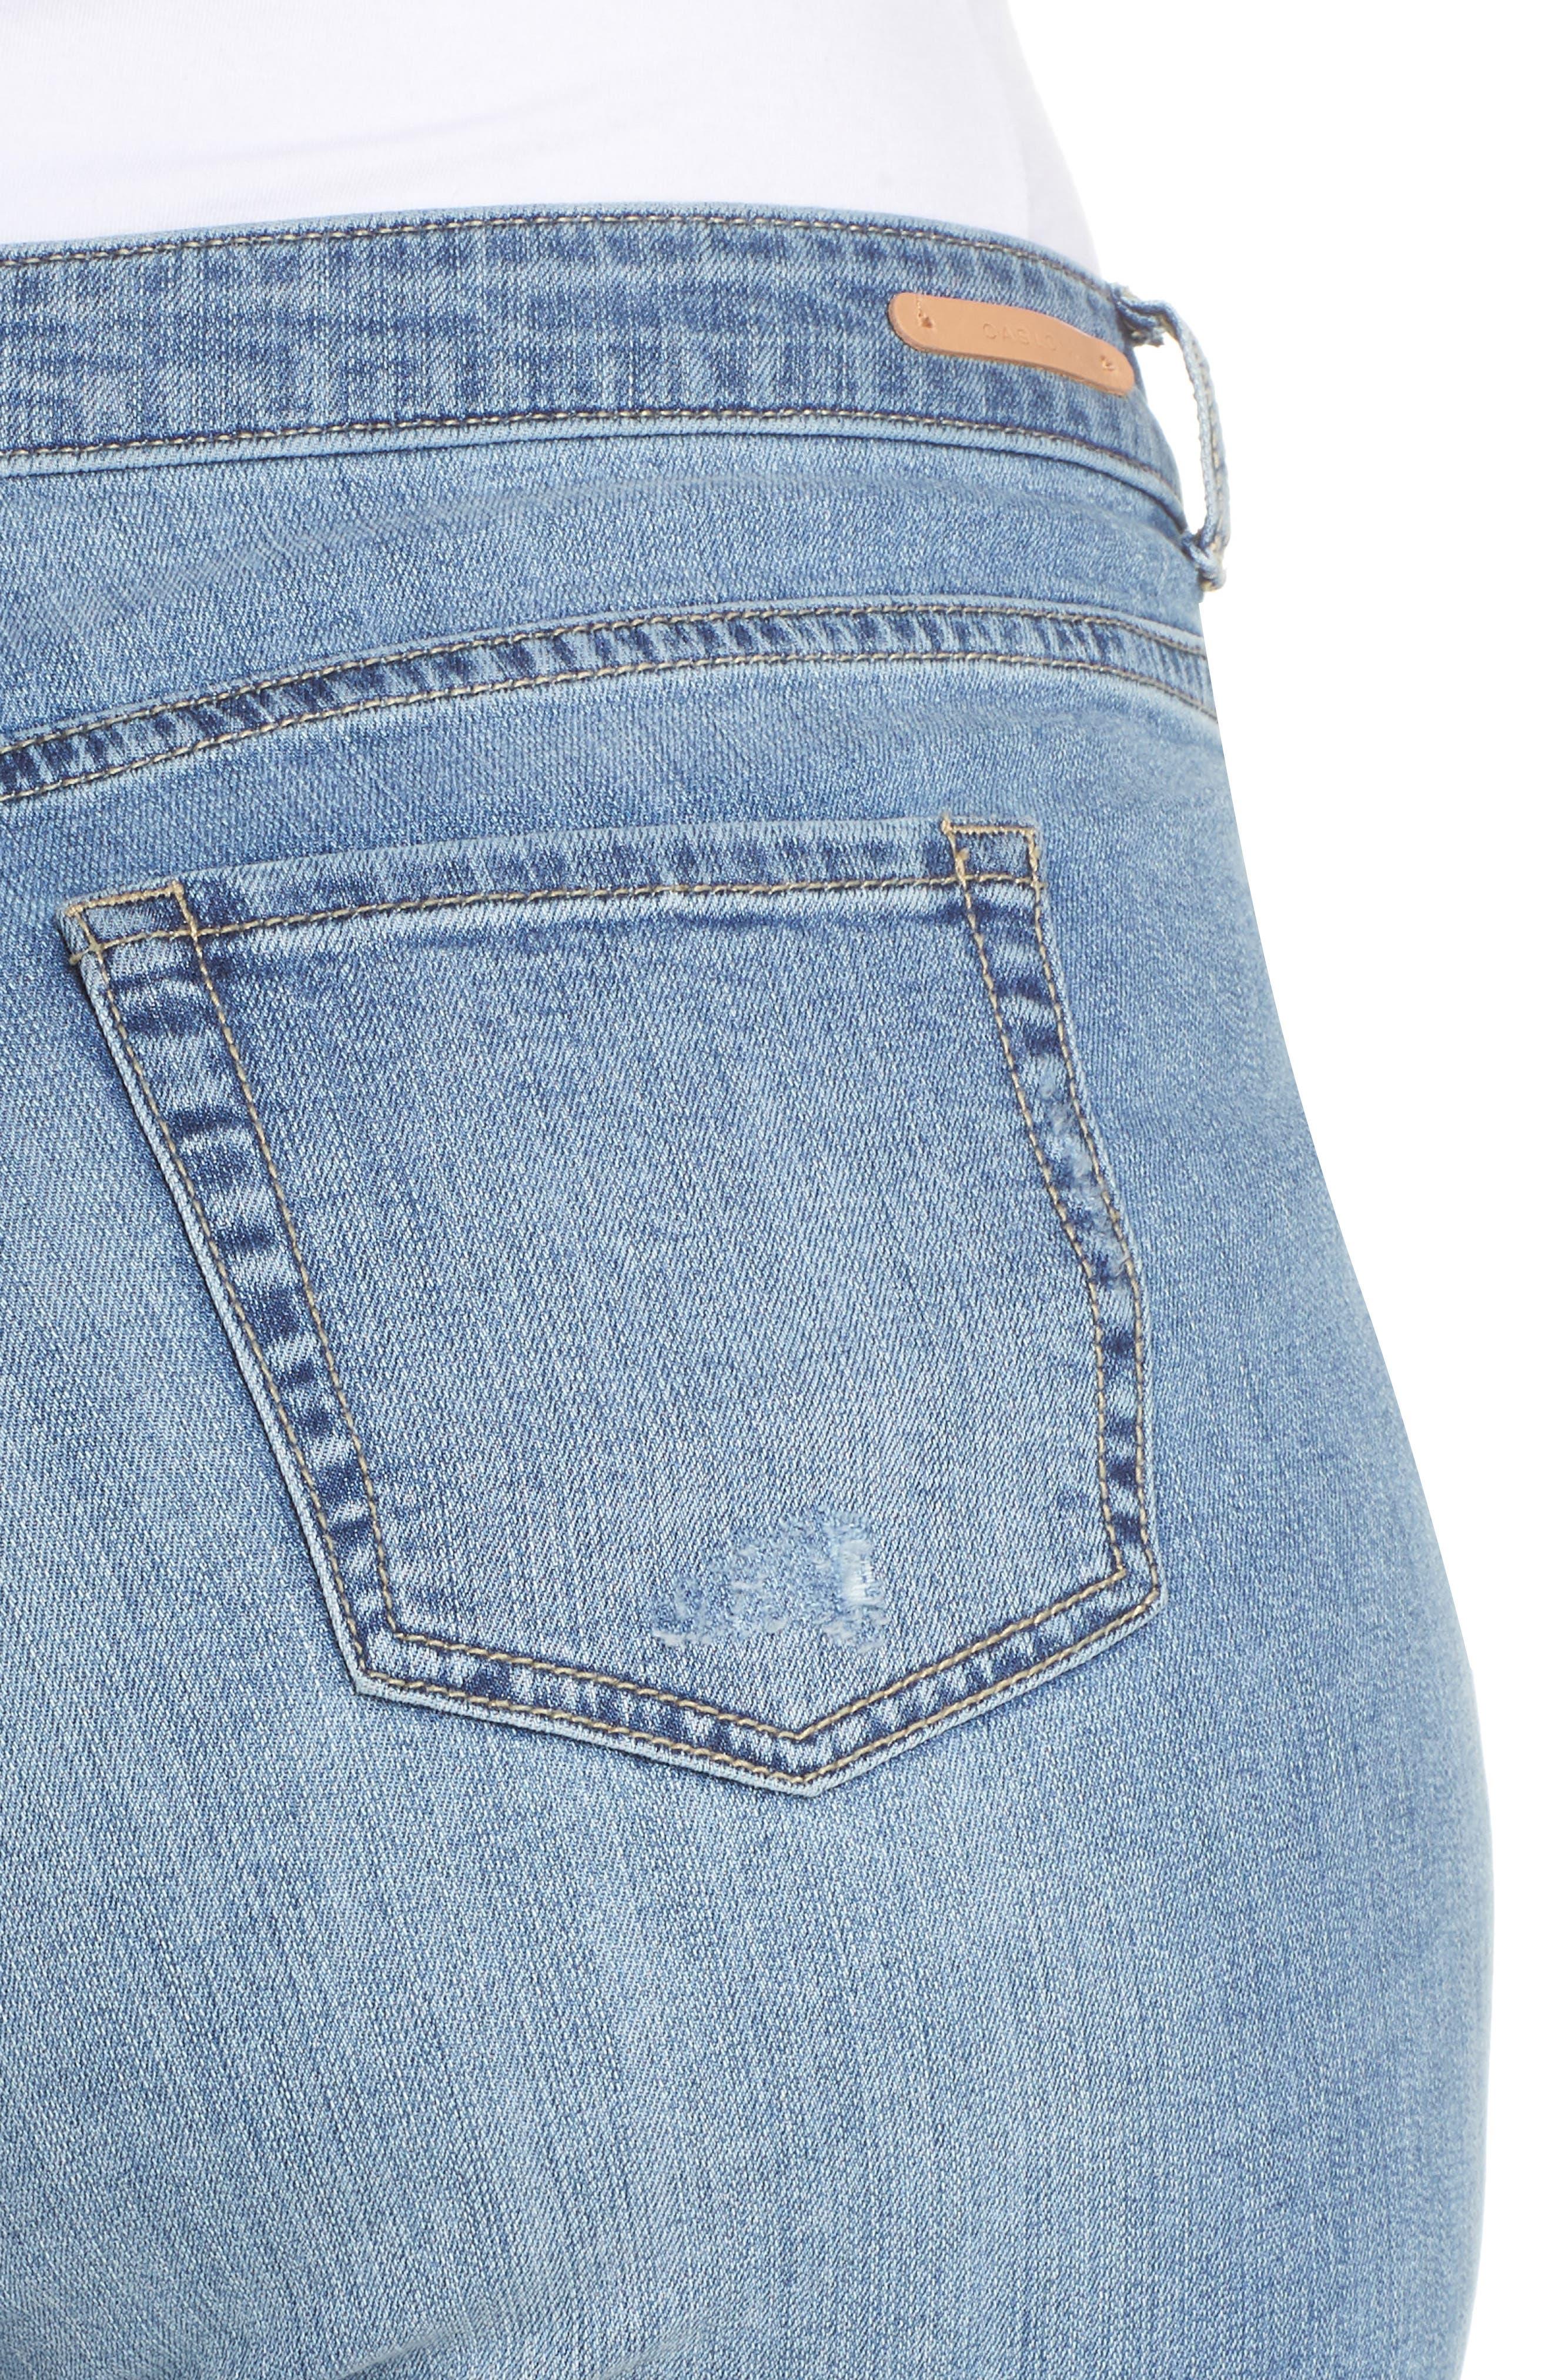 Distressed Jeans,                             Alternate thumbnail 3, color,                             Medium Destruct